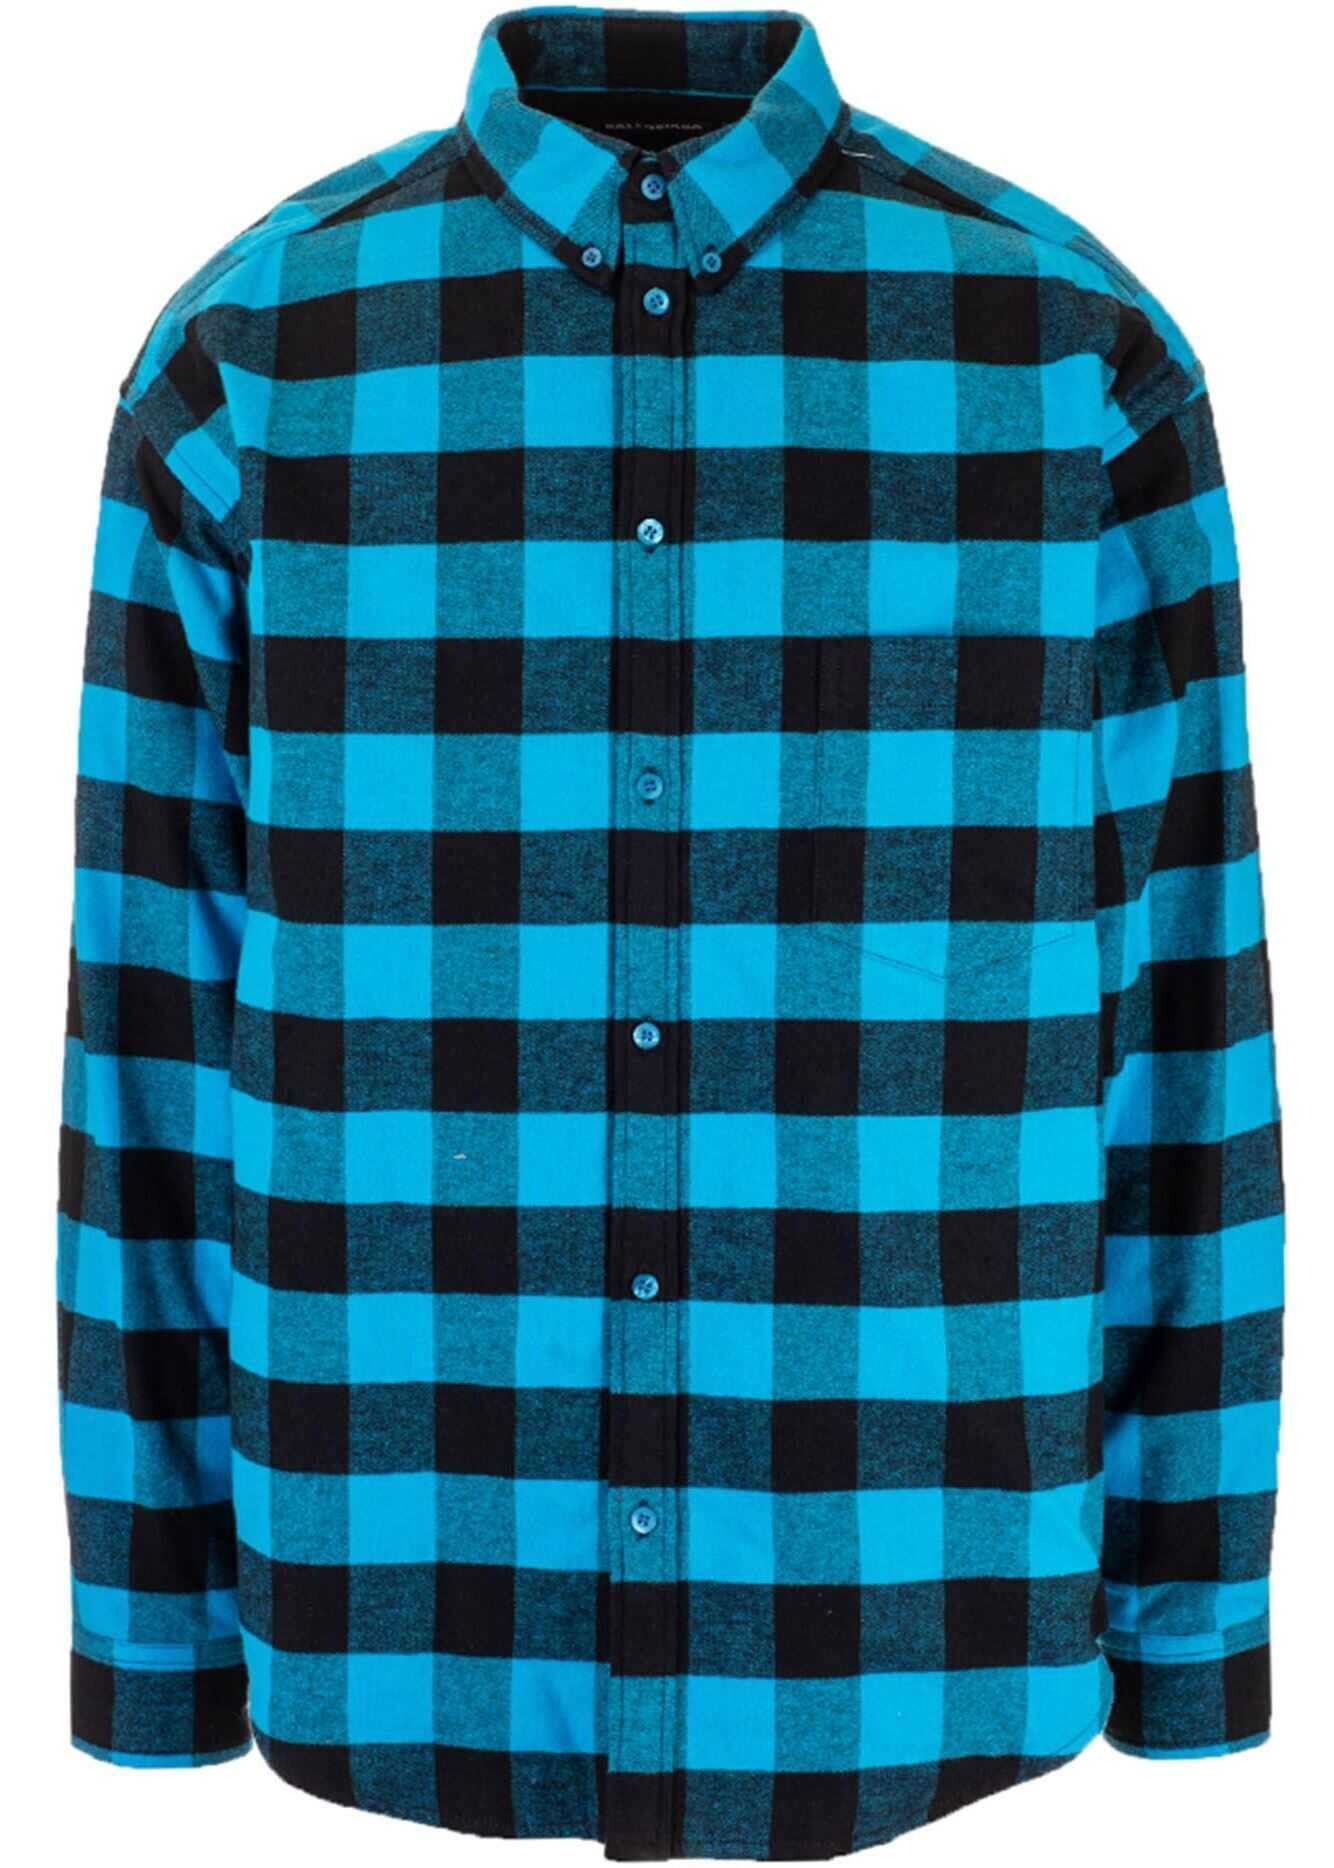 Balenciaga Checked Shirt In Blue And Black Light Blue imagine